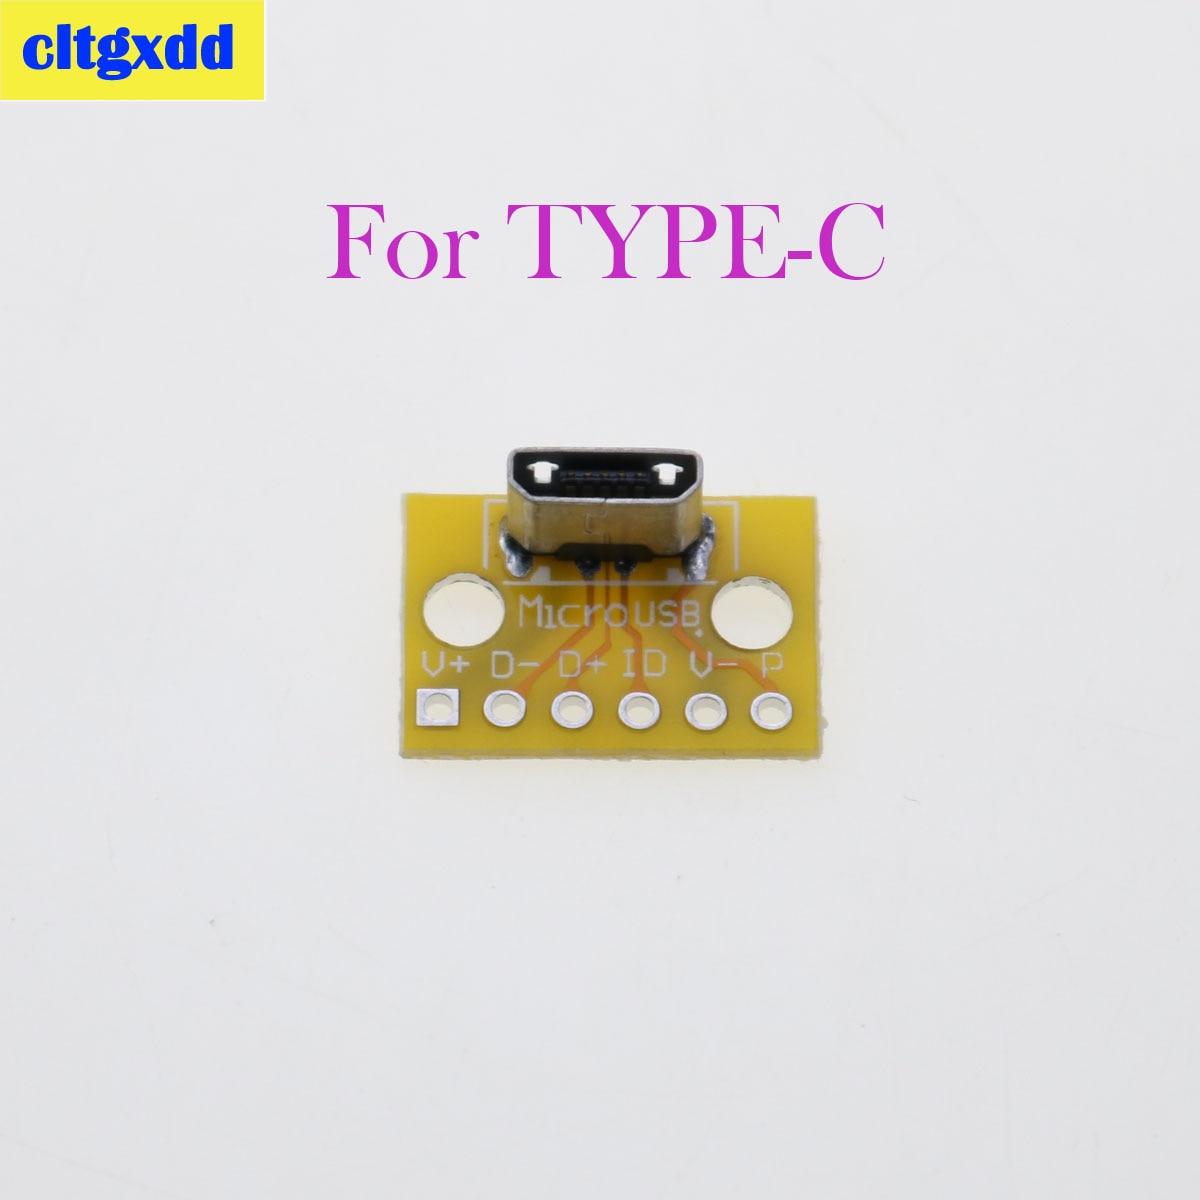 Cltgxdd 1 Uds MicroUSB USB Vertical tipo C Conector de cabeza macho hembra Adaptador convertidor PCB 180 grados Vertical